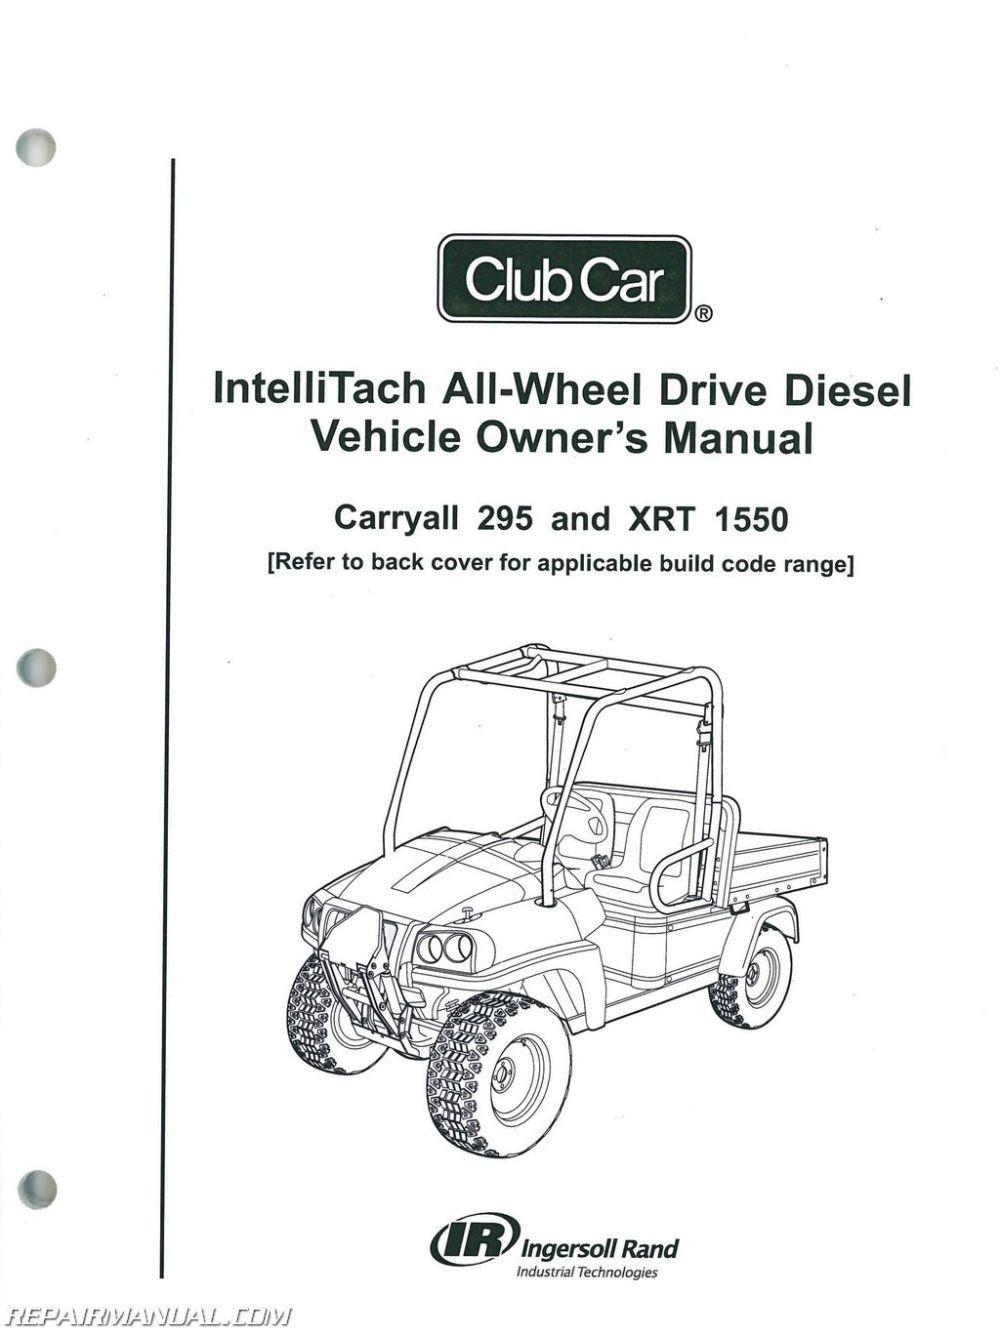 medium resolution of club car carryall 295 intellitach xrt 1550 intellitach